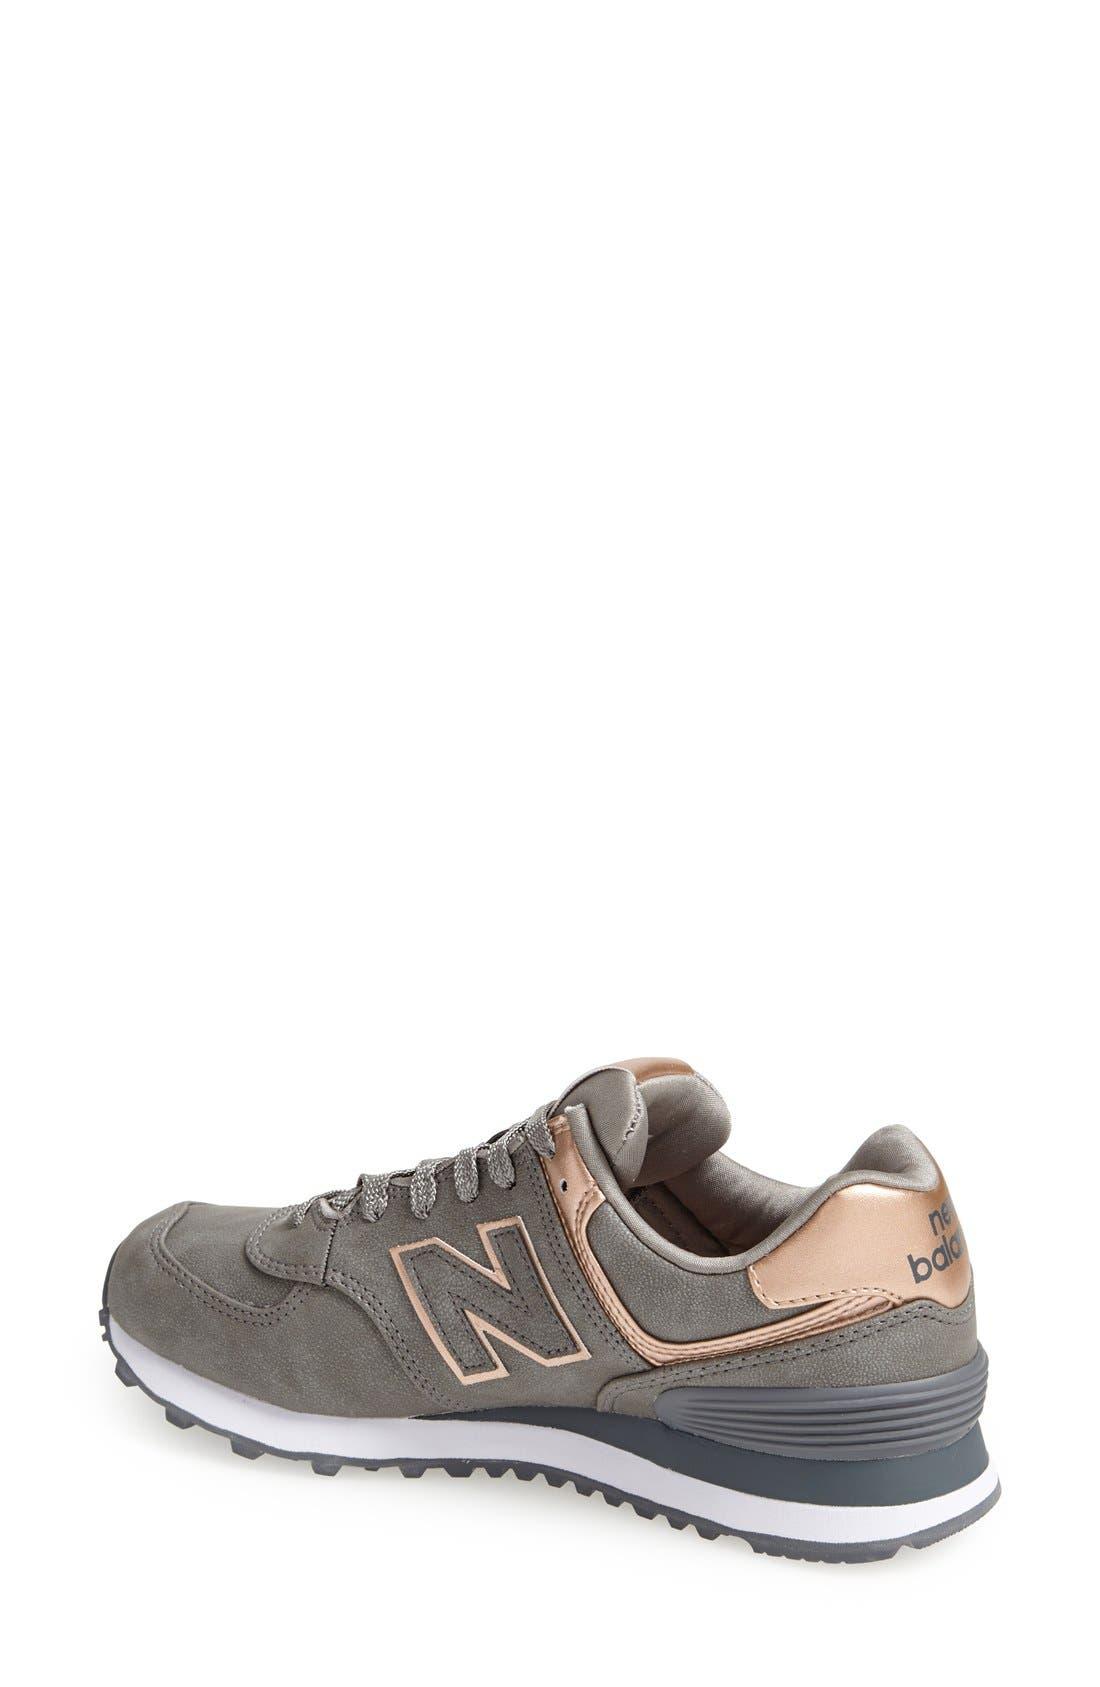 '574 - Precious Metals' Sneaker,                             Alternate thumbnail 3, color,                             040